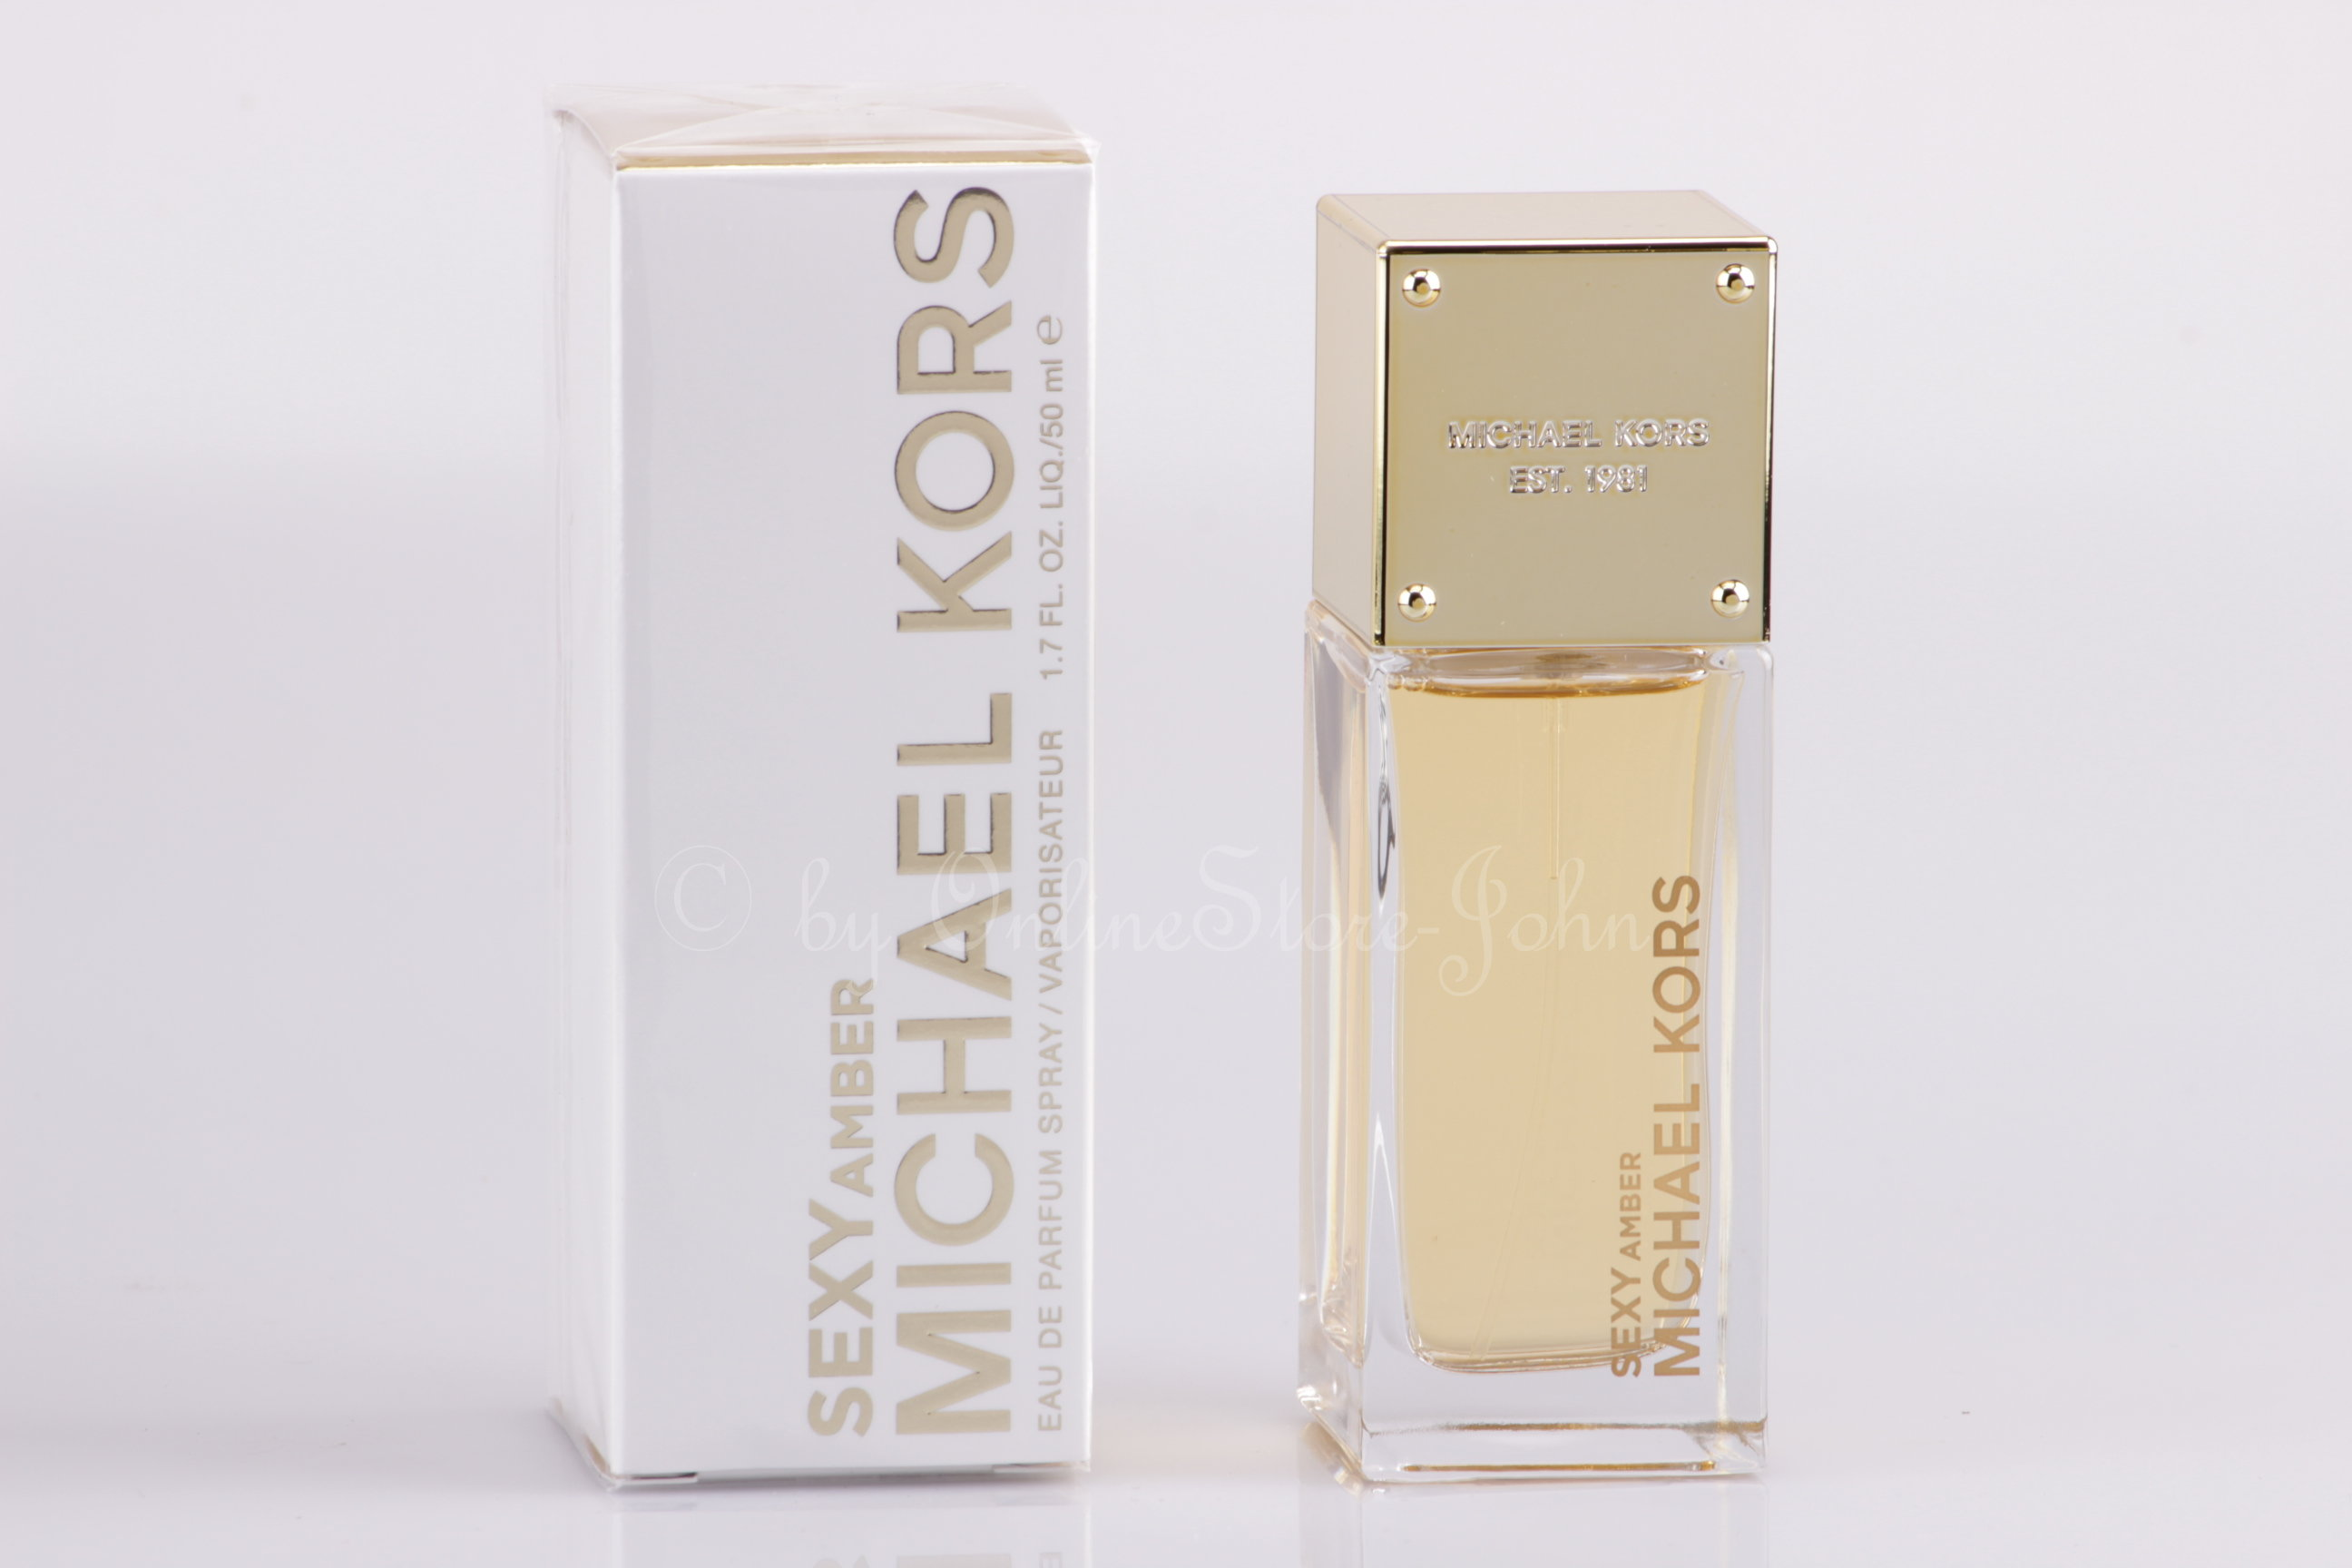 michael kors sexy amber 50ml edp eau de parfum. Black Bedroom Furniture Sets. Home Design Ideas